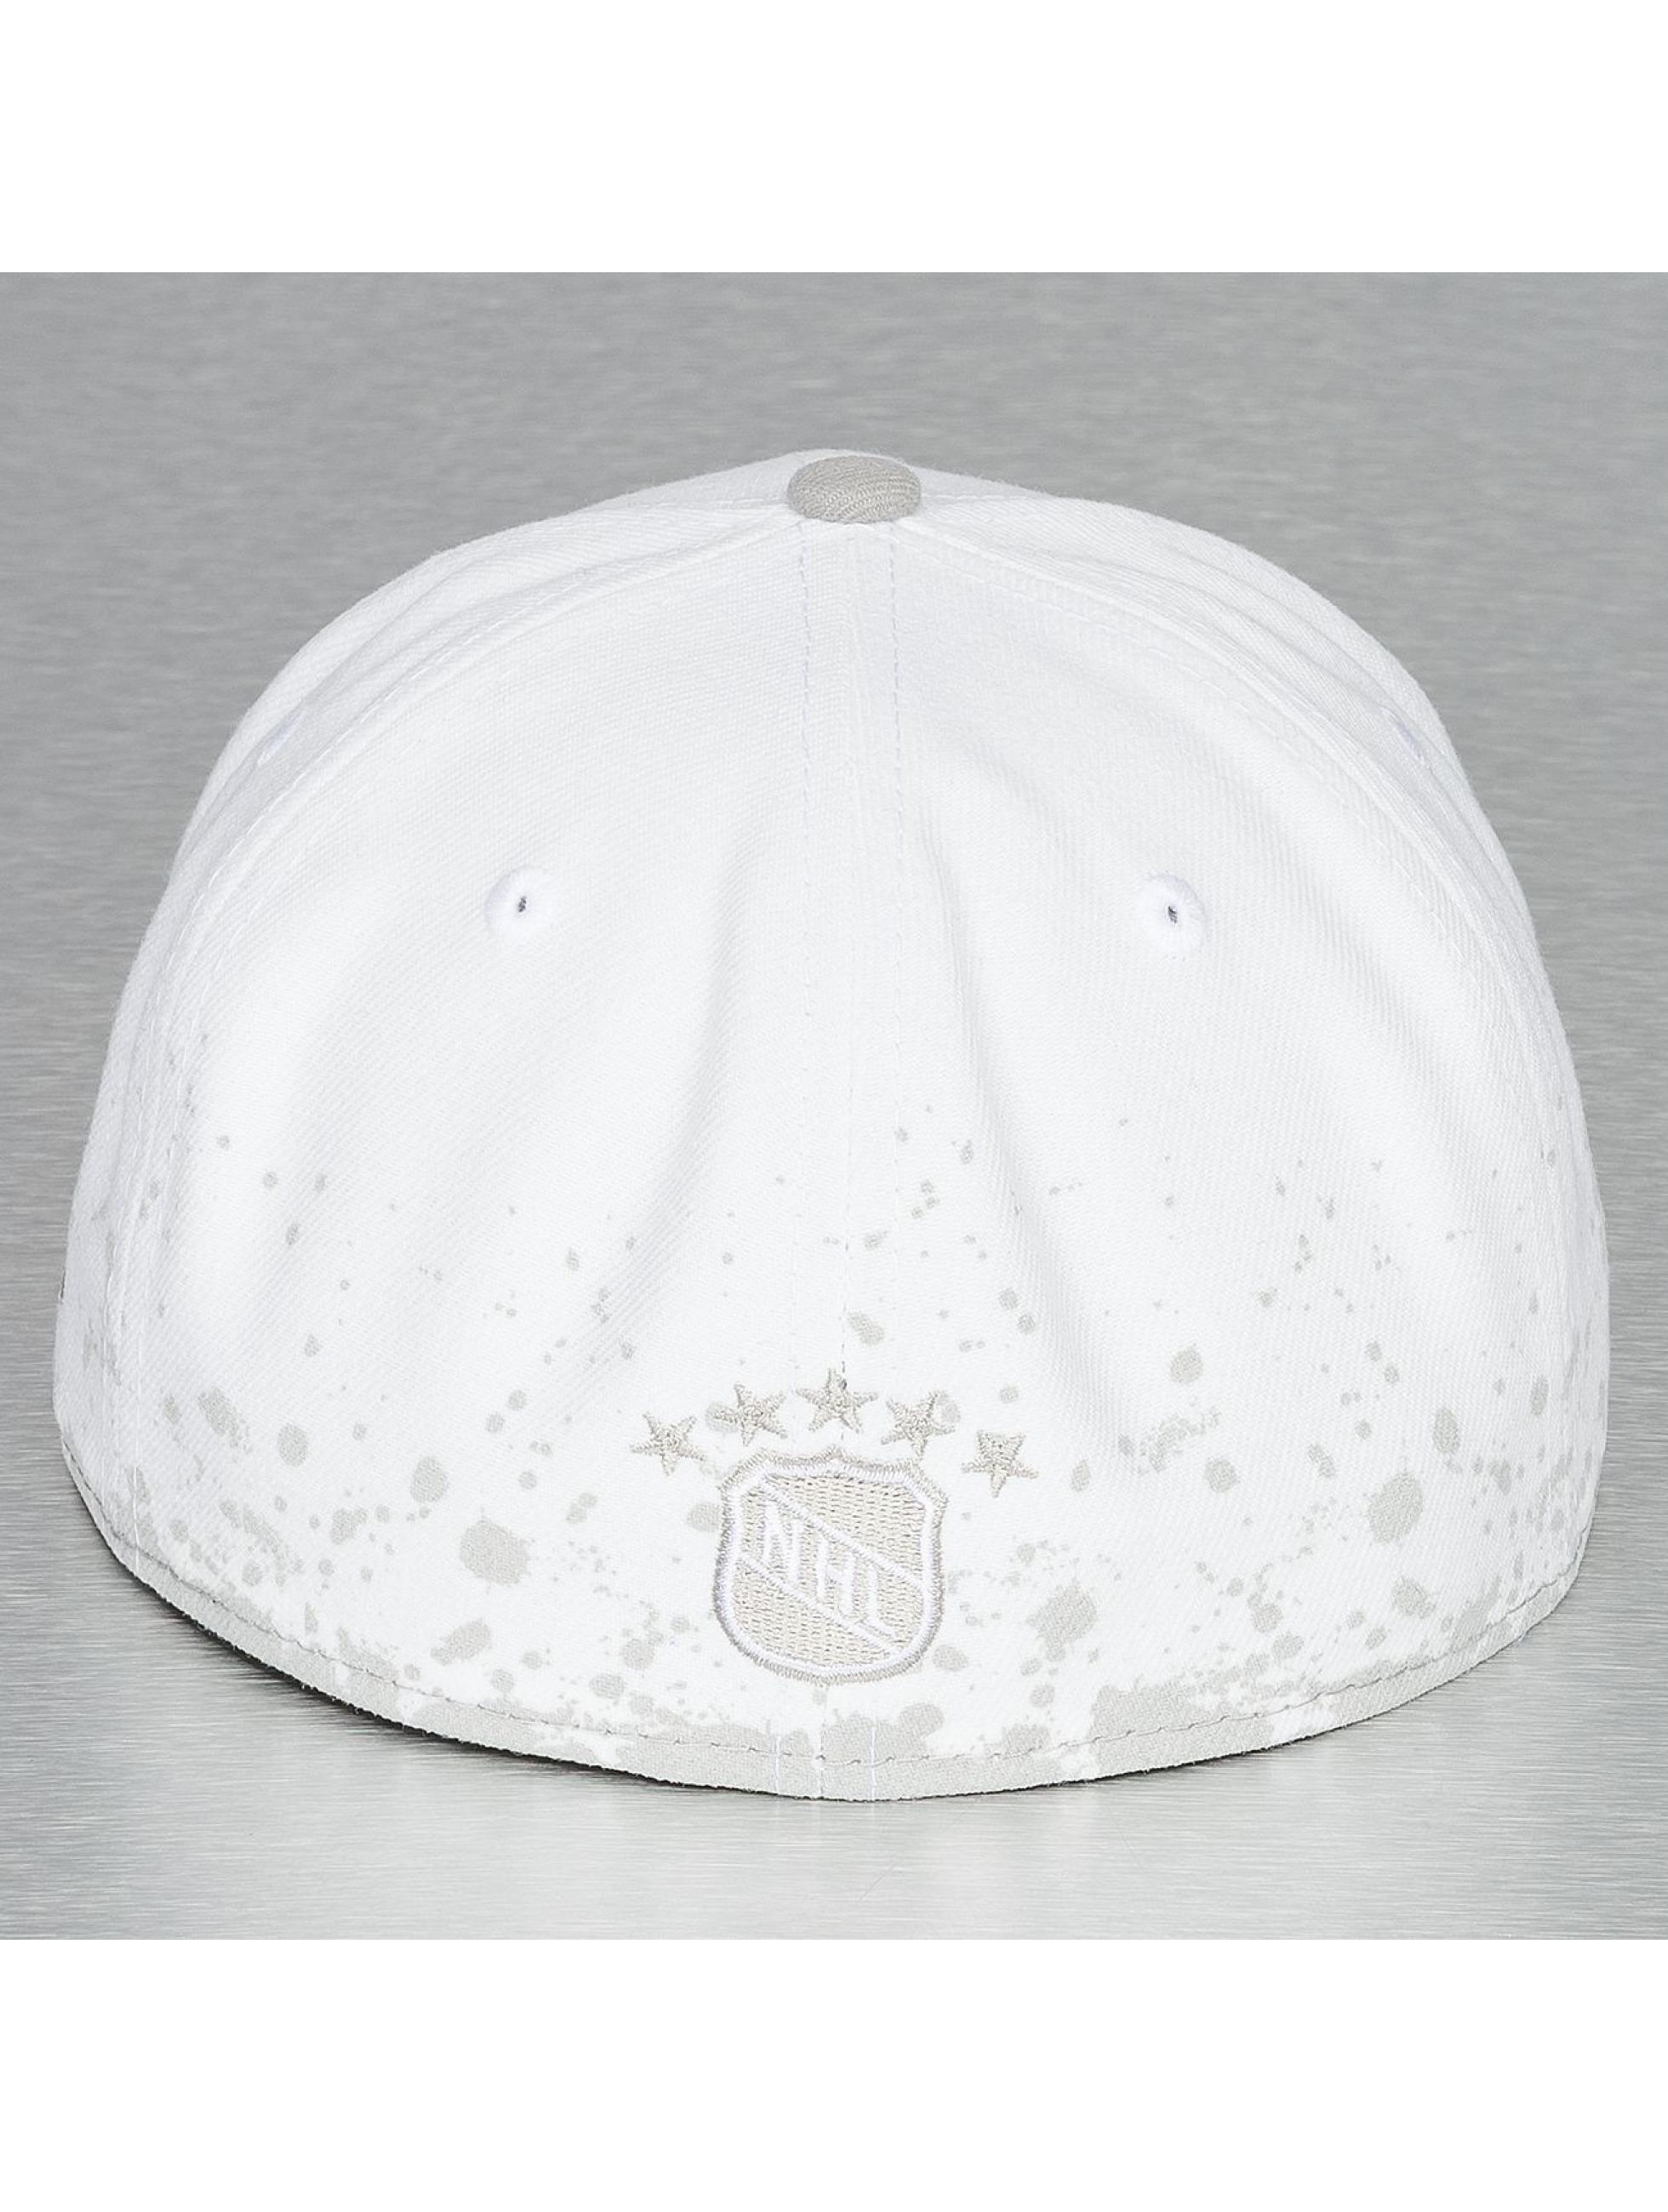 New Era Casquette Fitted Panel Splatter LA Kings 59Fifty blanc